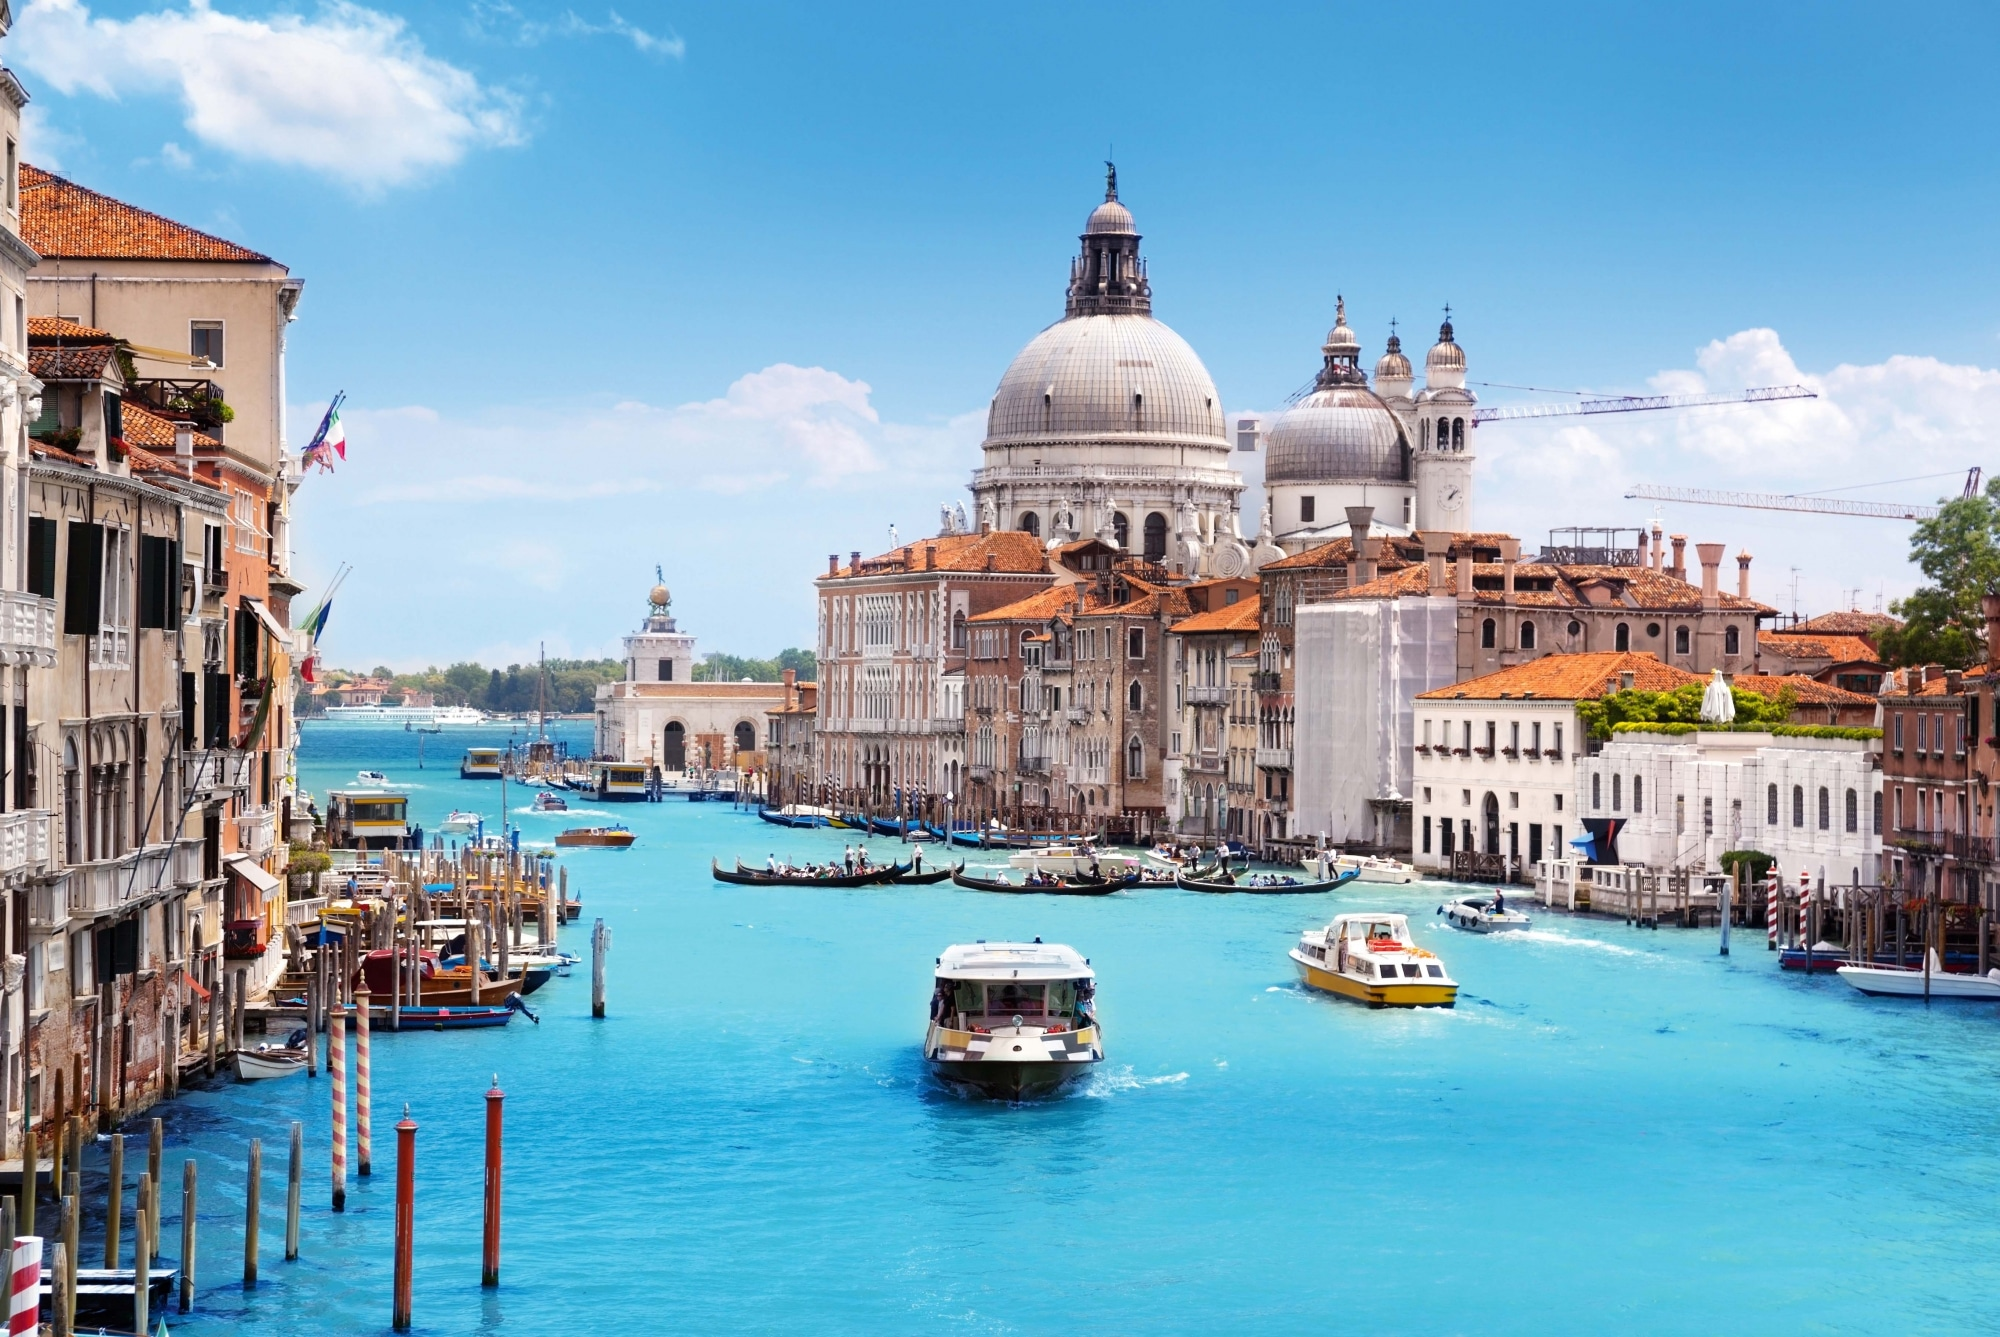 Venedig, Canale Grande, Basilica Santa Maria della Salute,